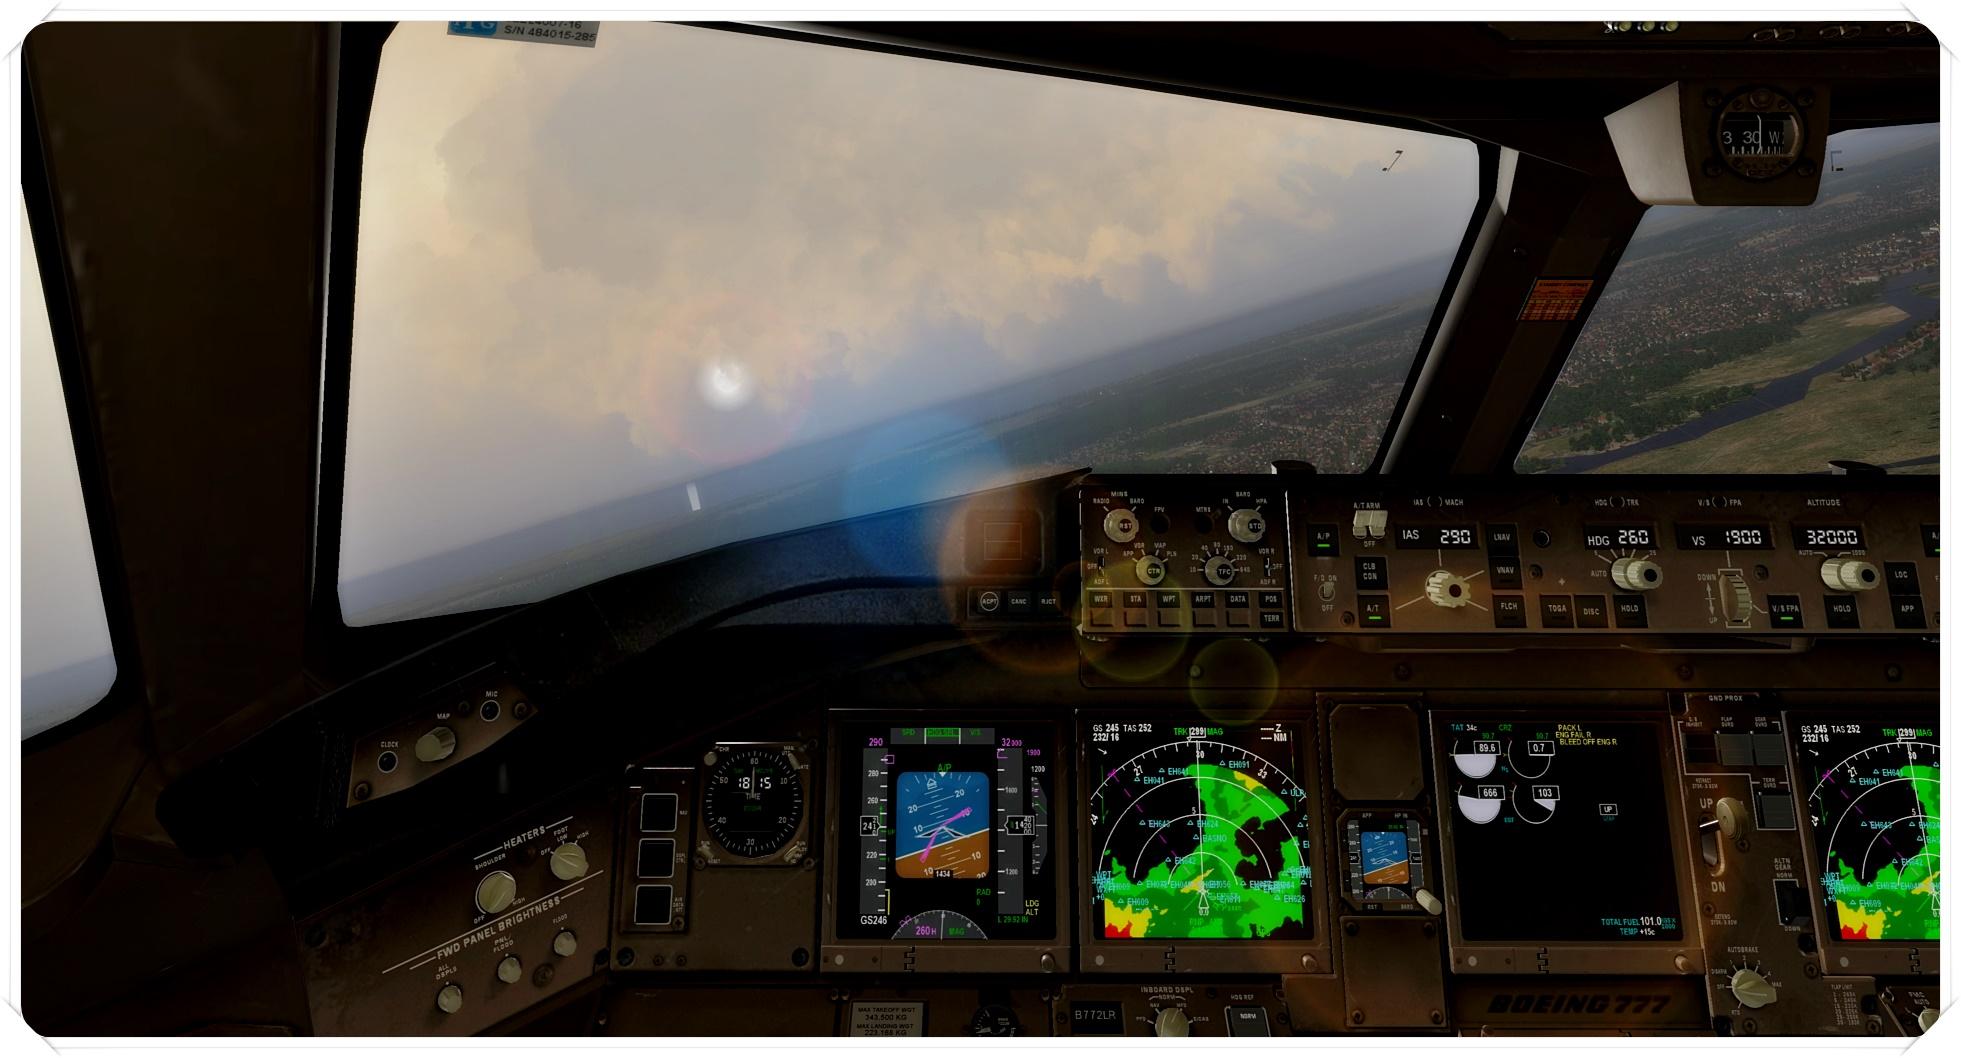 777-200lr_5fgqvr.jpg